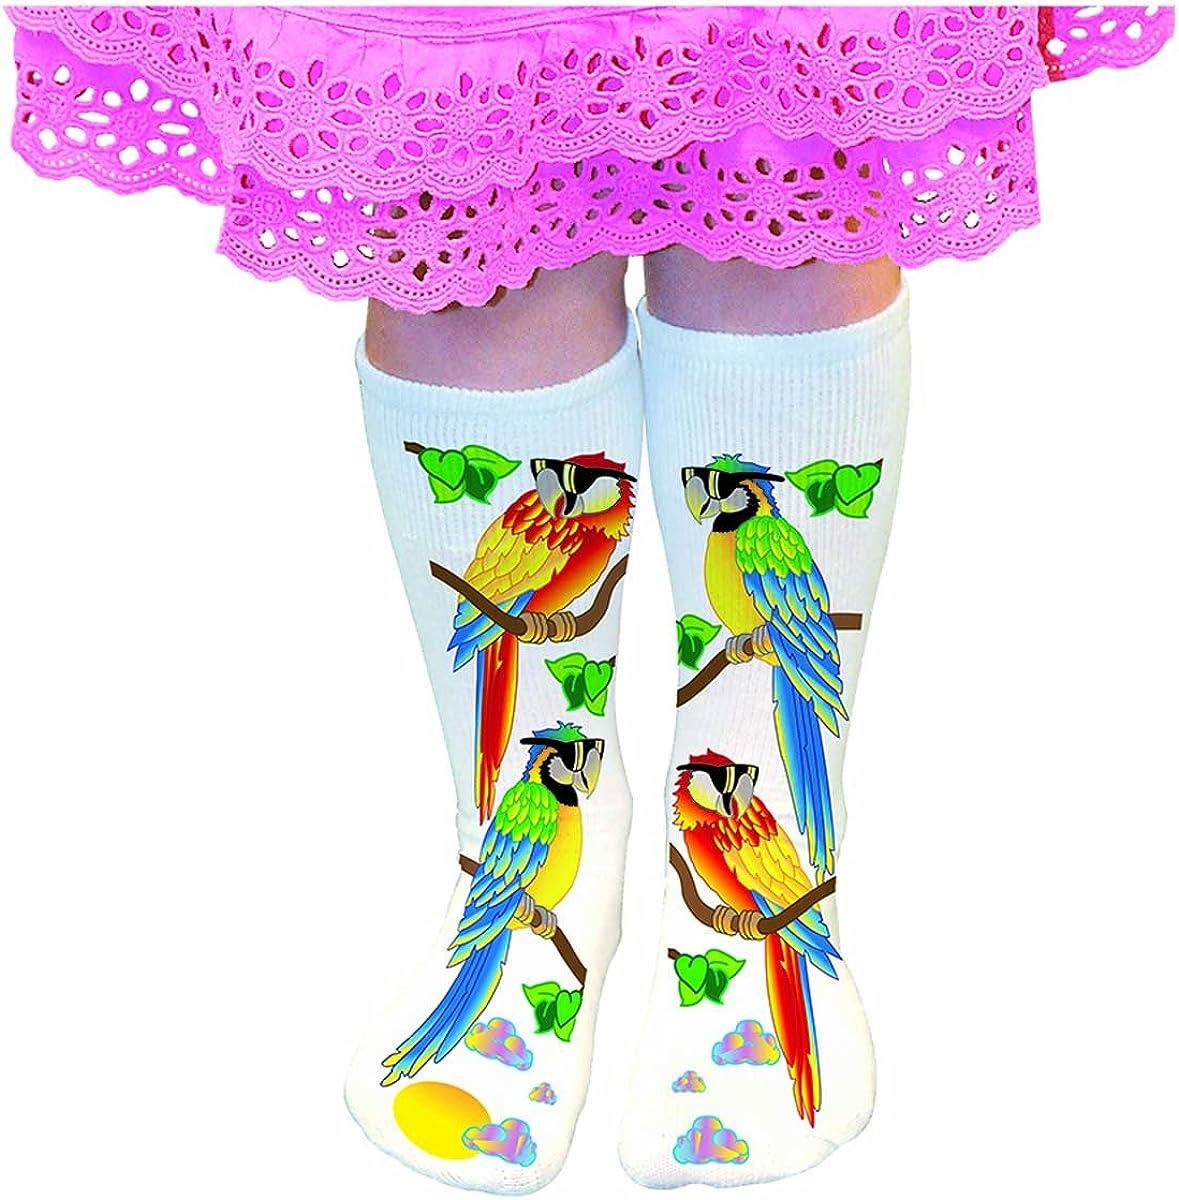 Parrots Socks